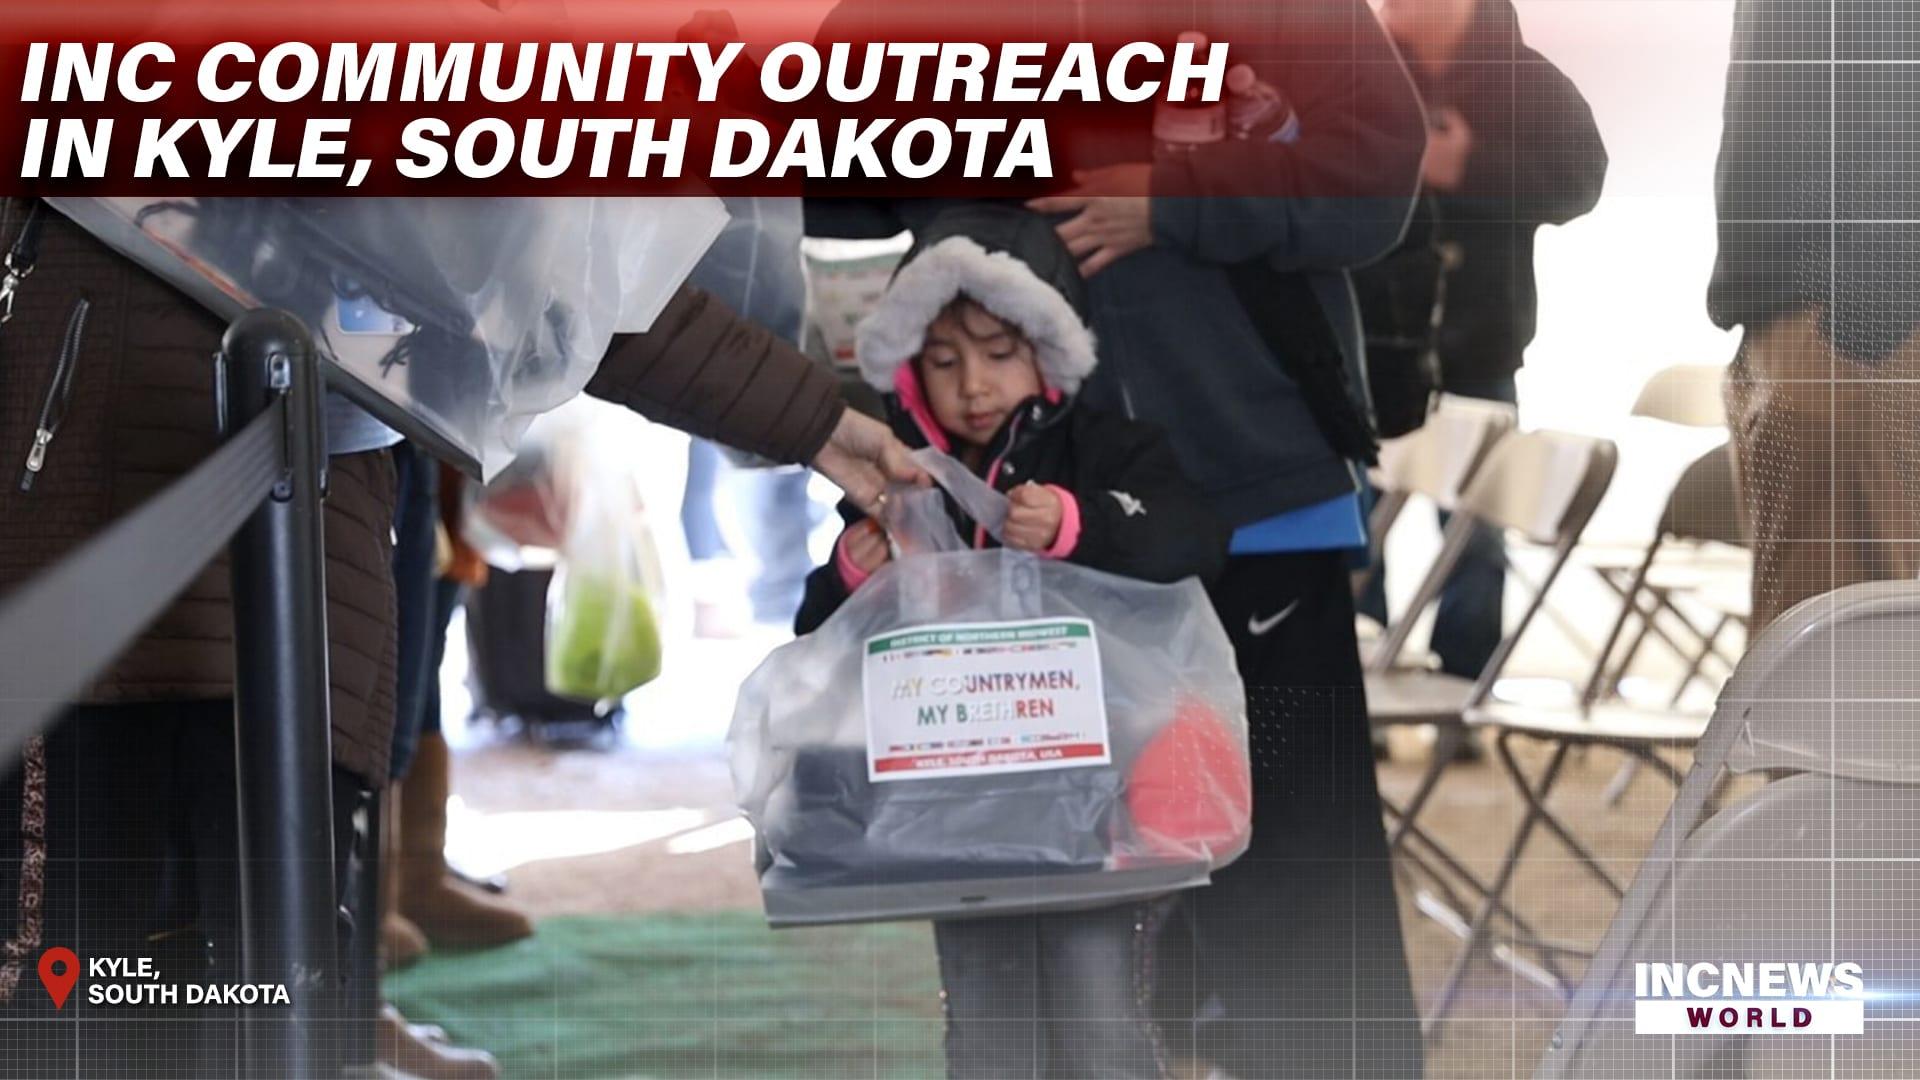 INC Community Outreach in Kyle, South Dakota